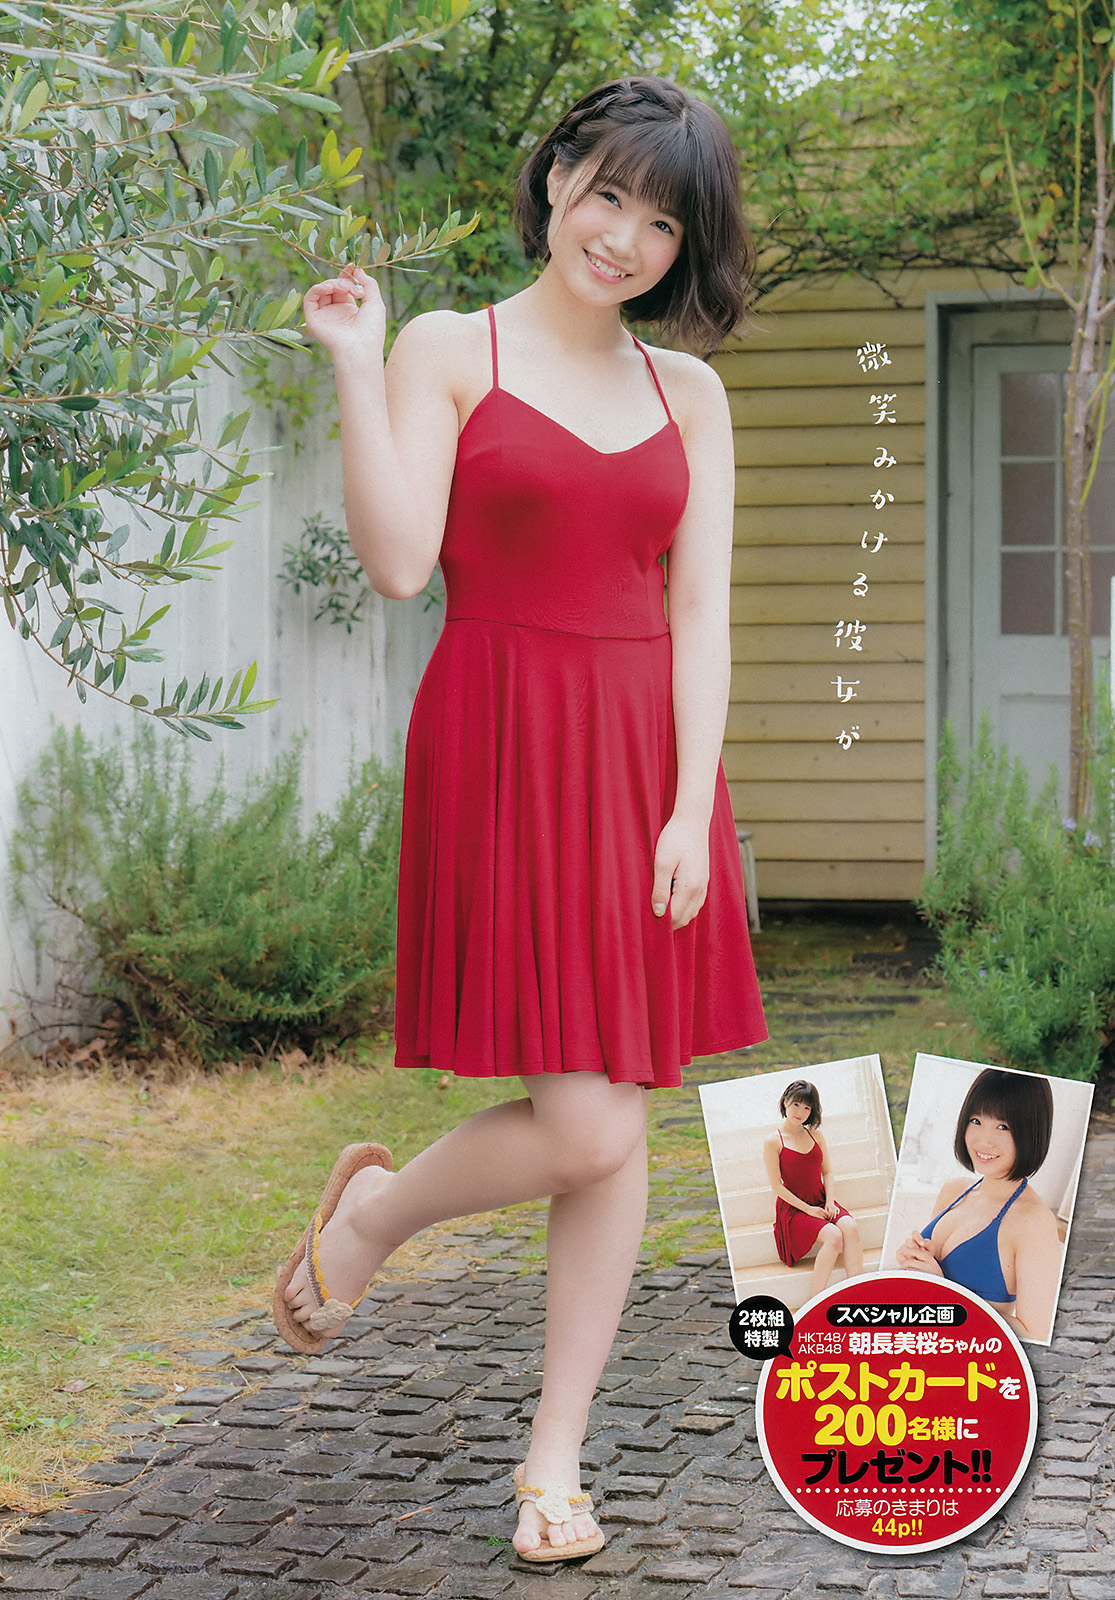 HKT48朝長美桜(19)の水着グラビア、キャバ嬢姿のエロ画像50枚・23枚目の画像